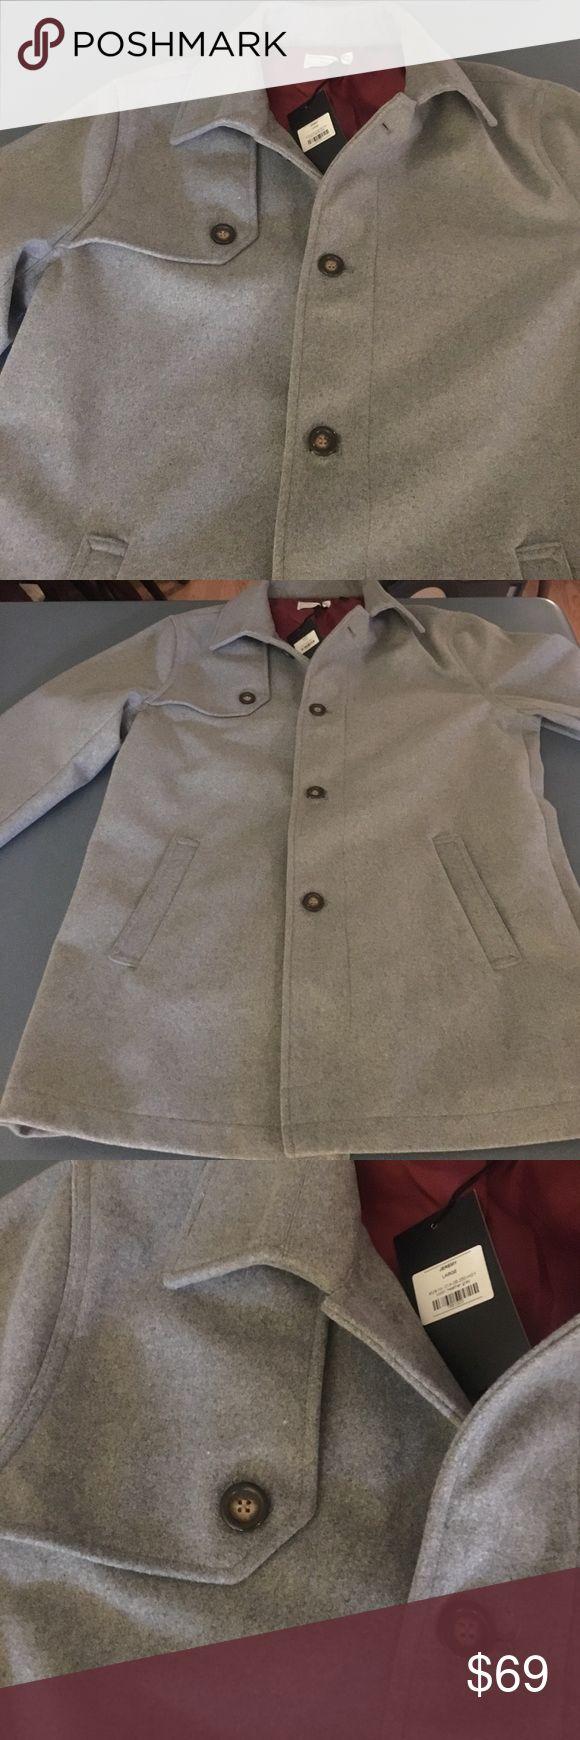 Heather Gray PeaCoat - Brand New - Large Heather Gray PeaCoat - Brand New - Large Jackets & Coats Pea Coats